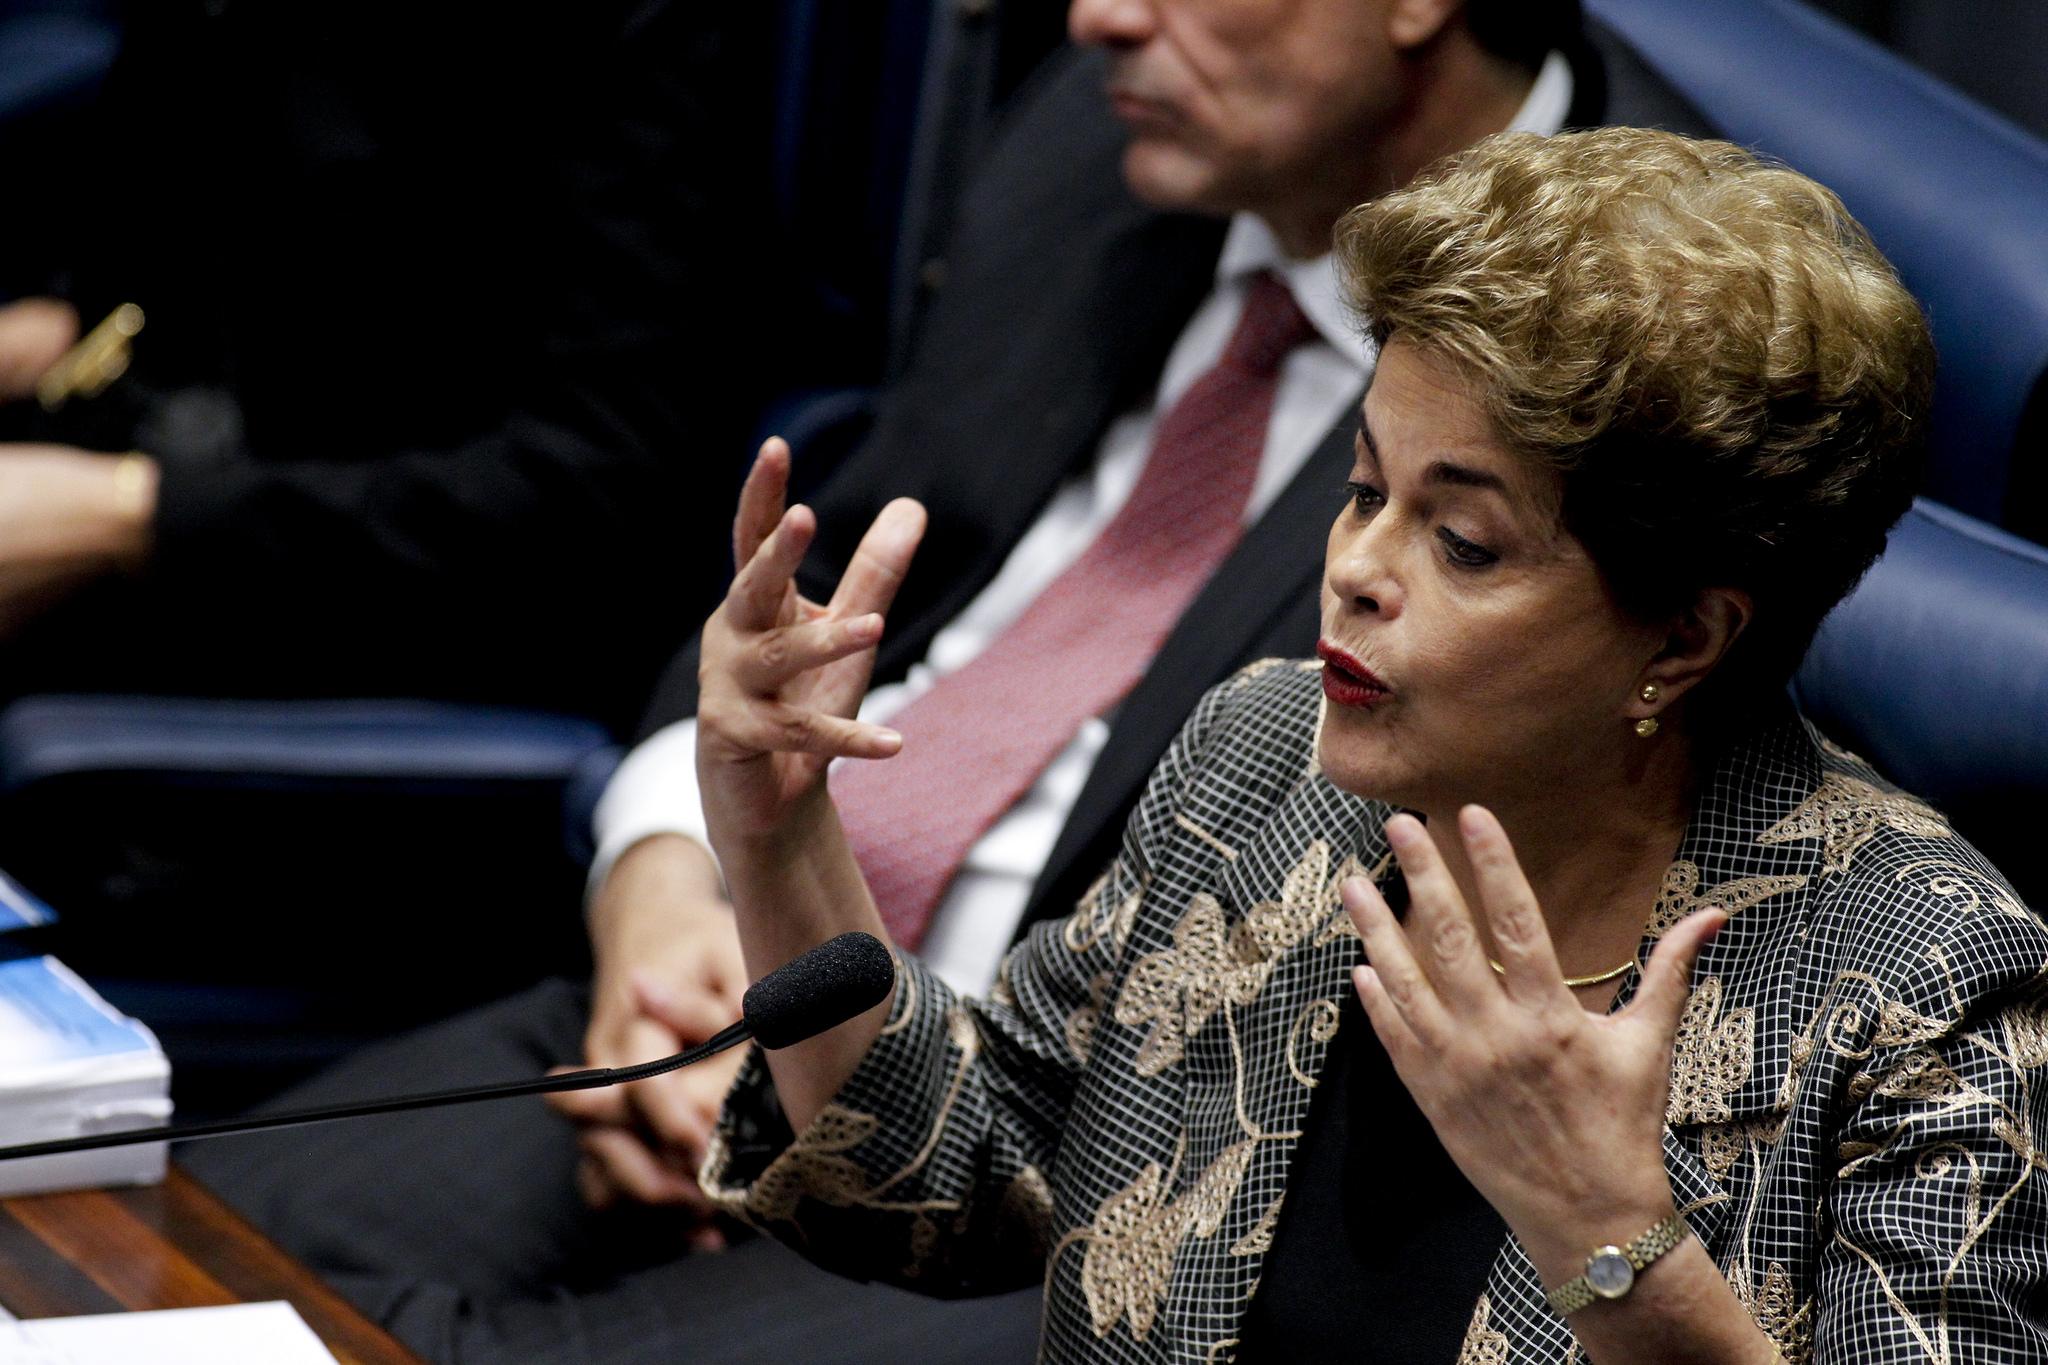 Marri Nogueira/Agência Senado